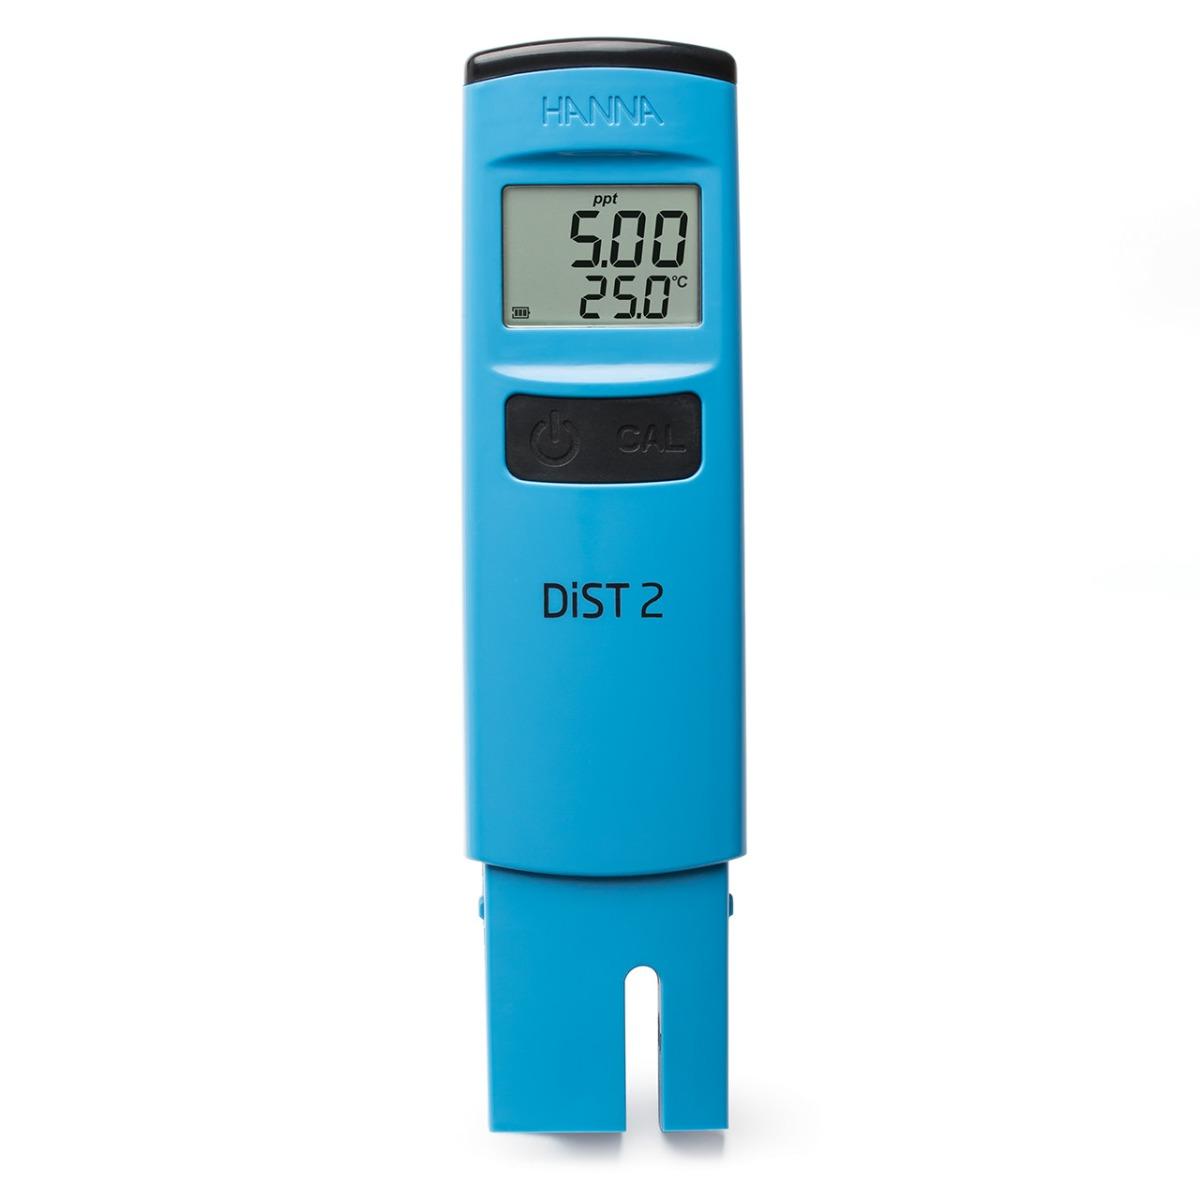 HI98302 - DiST®2 misuratore tascabile di TDS scala alta (10 g/l)